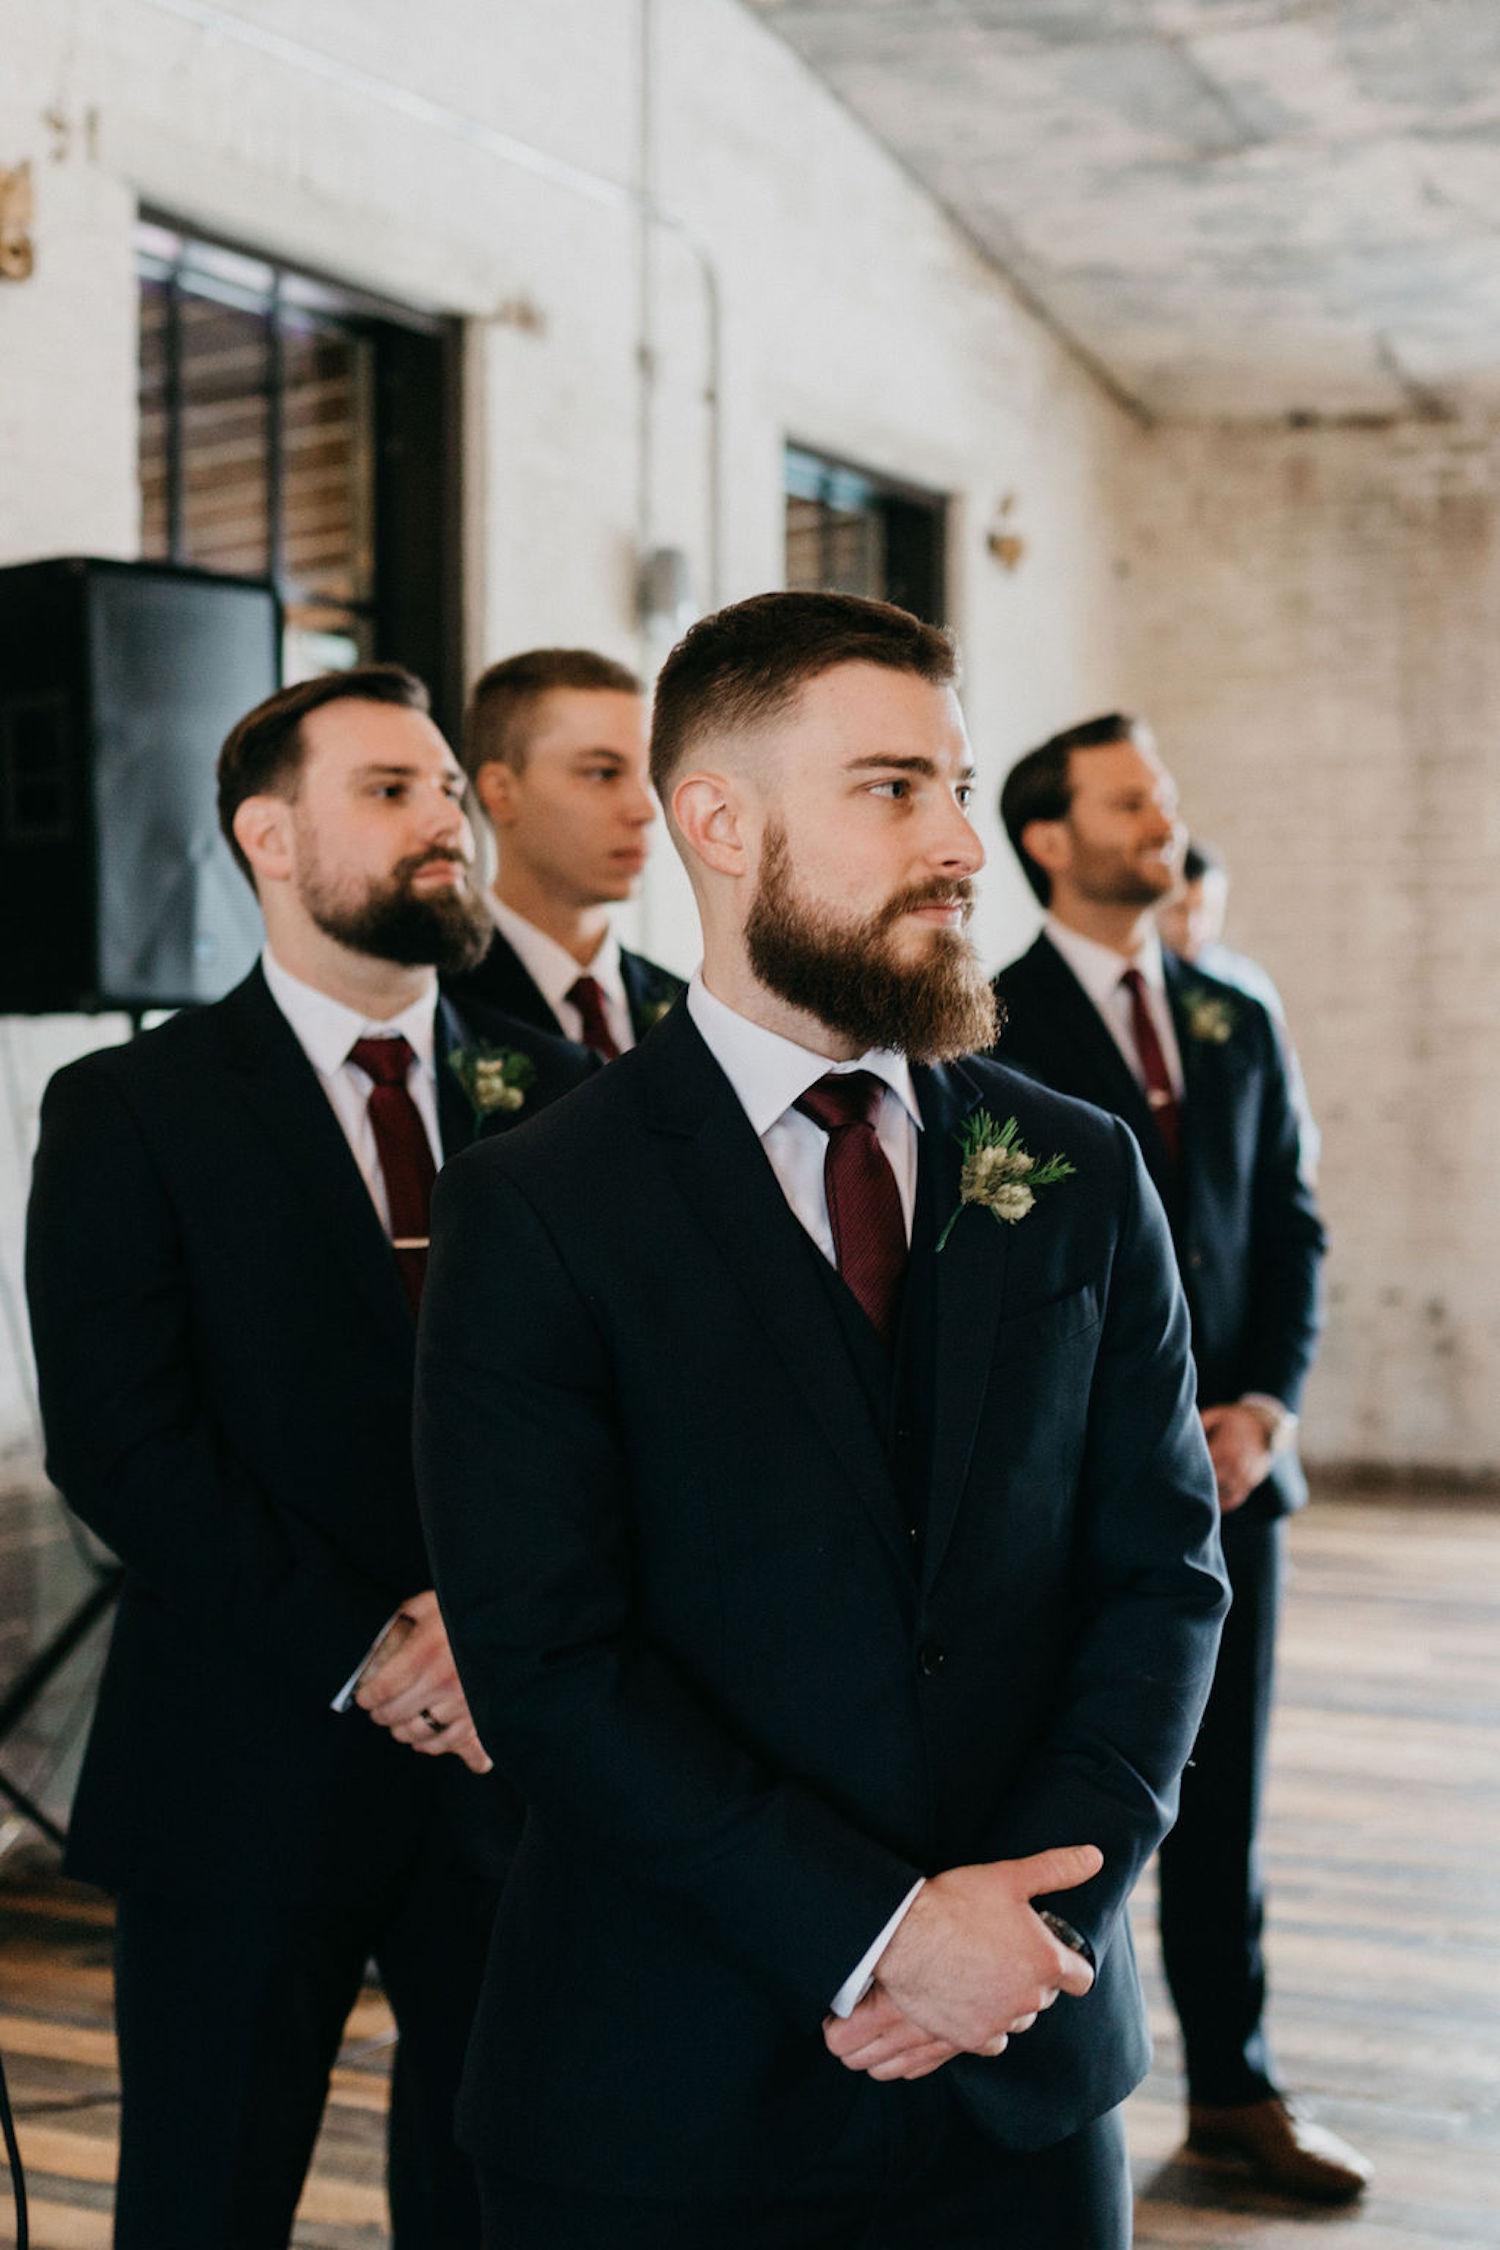 Groom standing with groomsman at Journeyman Distillery wedding